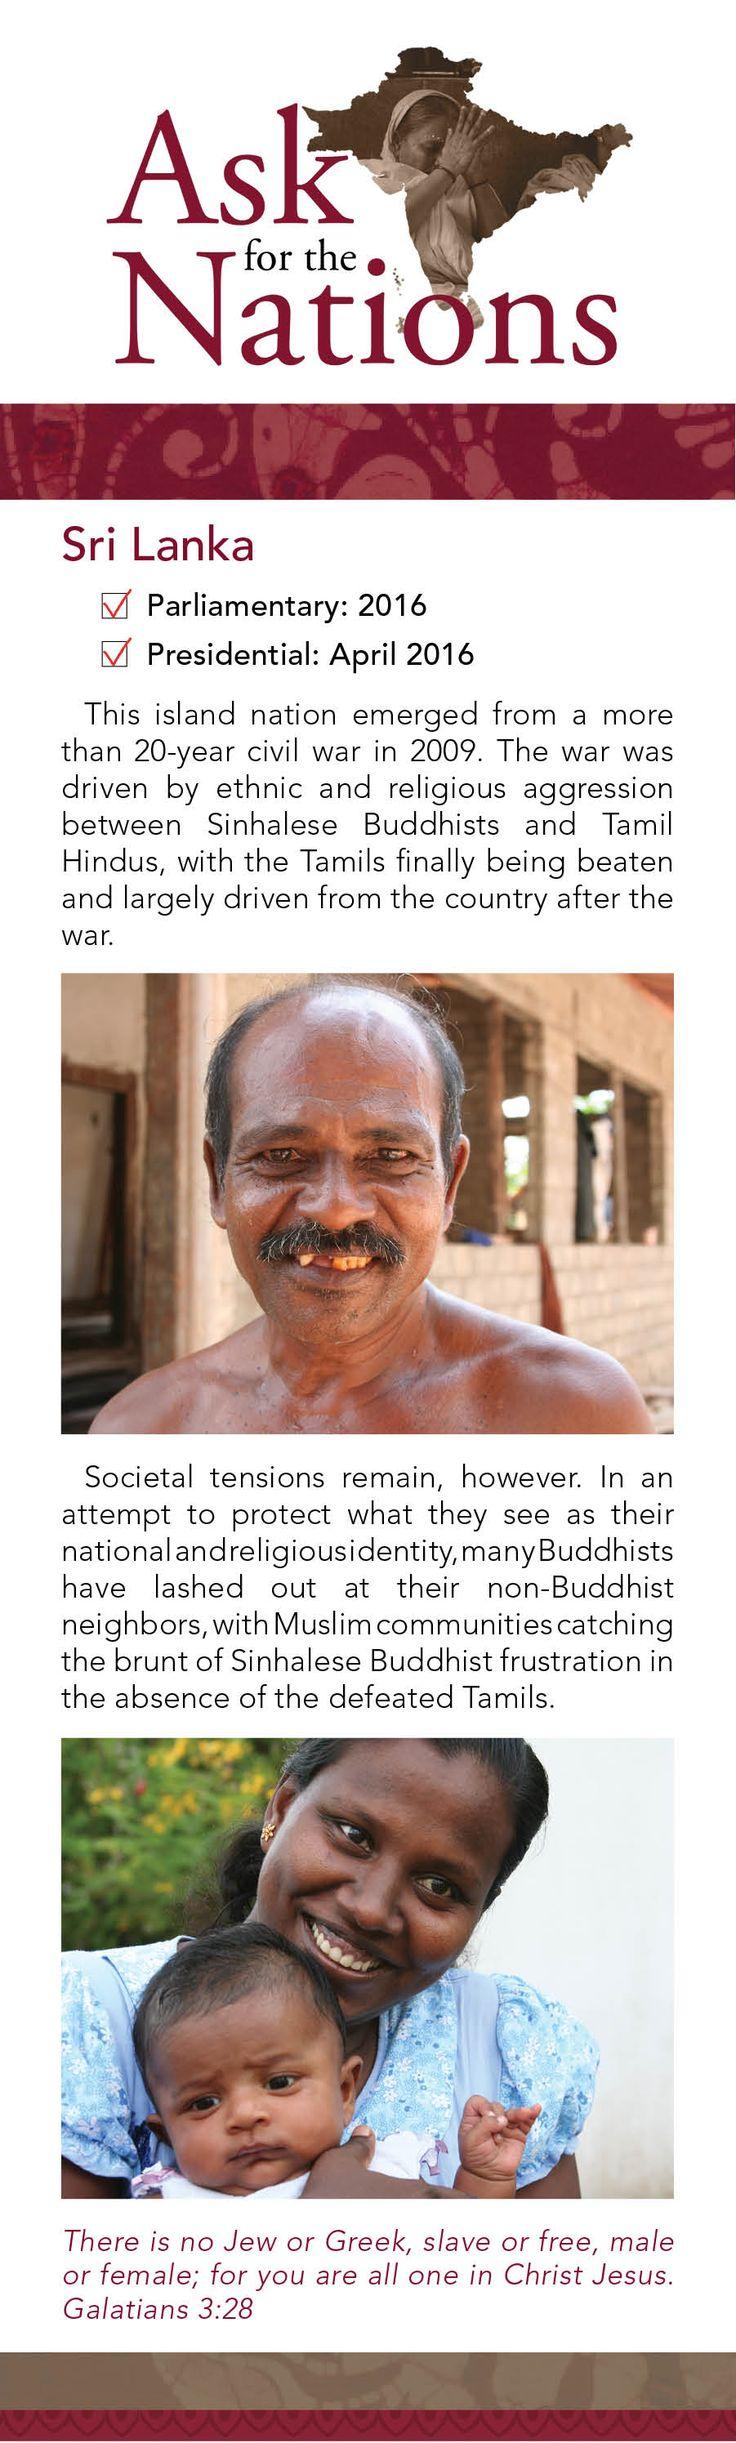 Sri Lanka is still healing from a brutal civil war - will you pray for them?